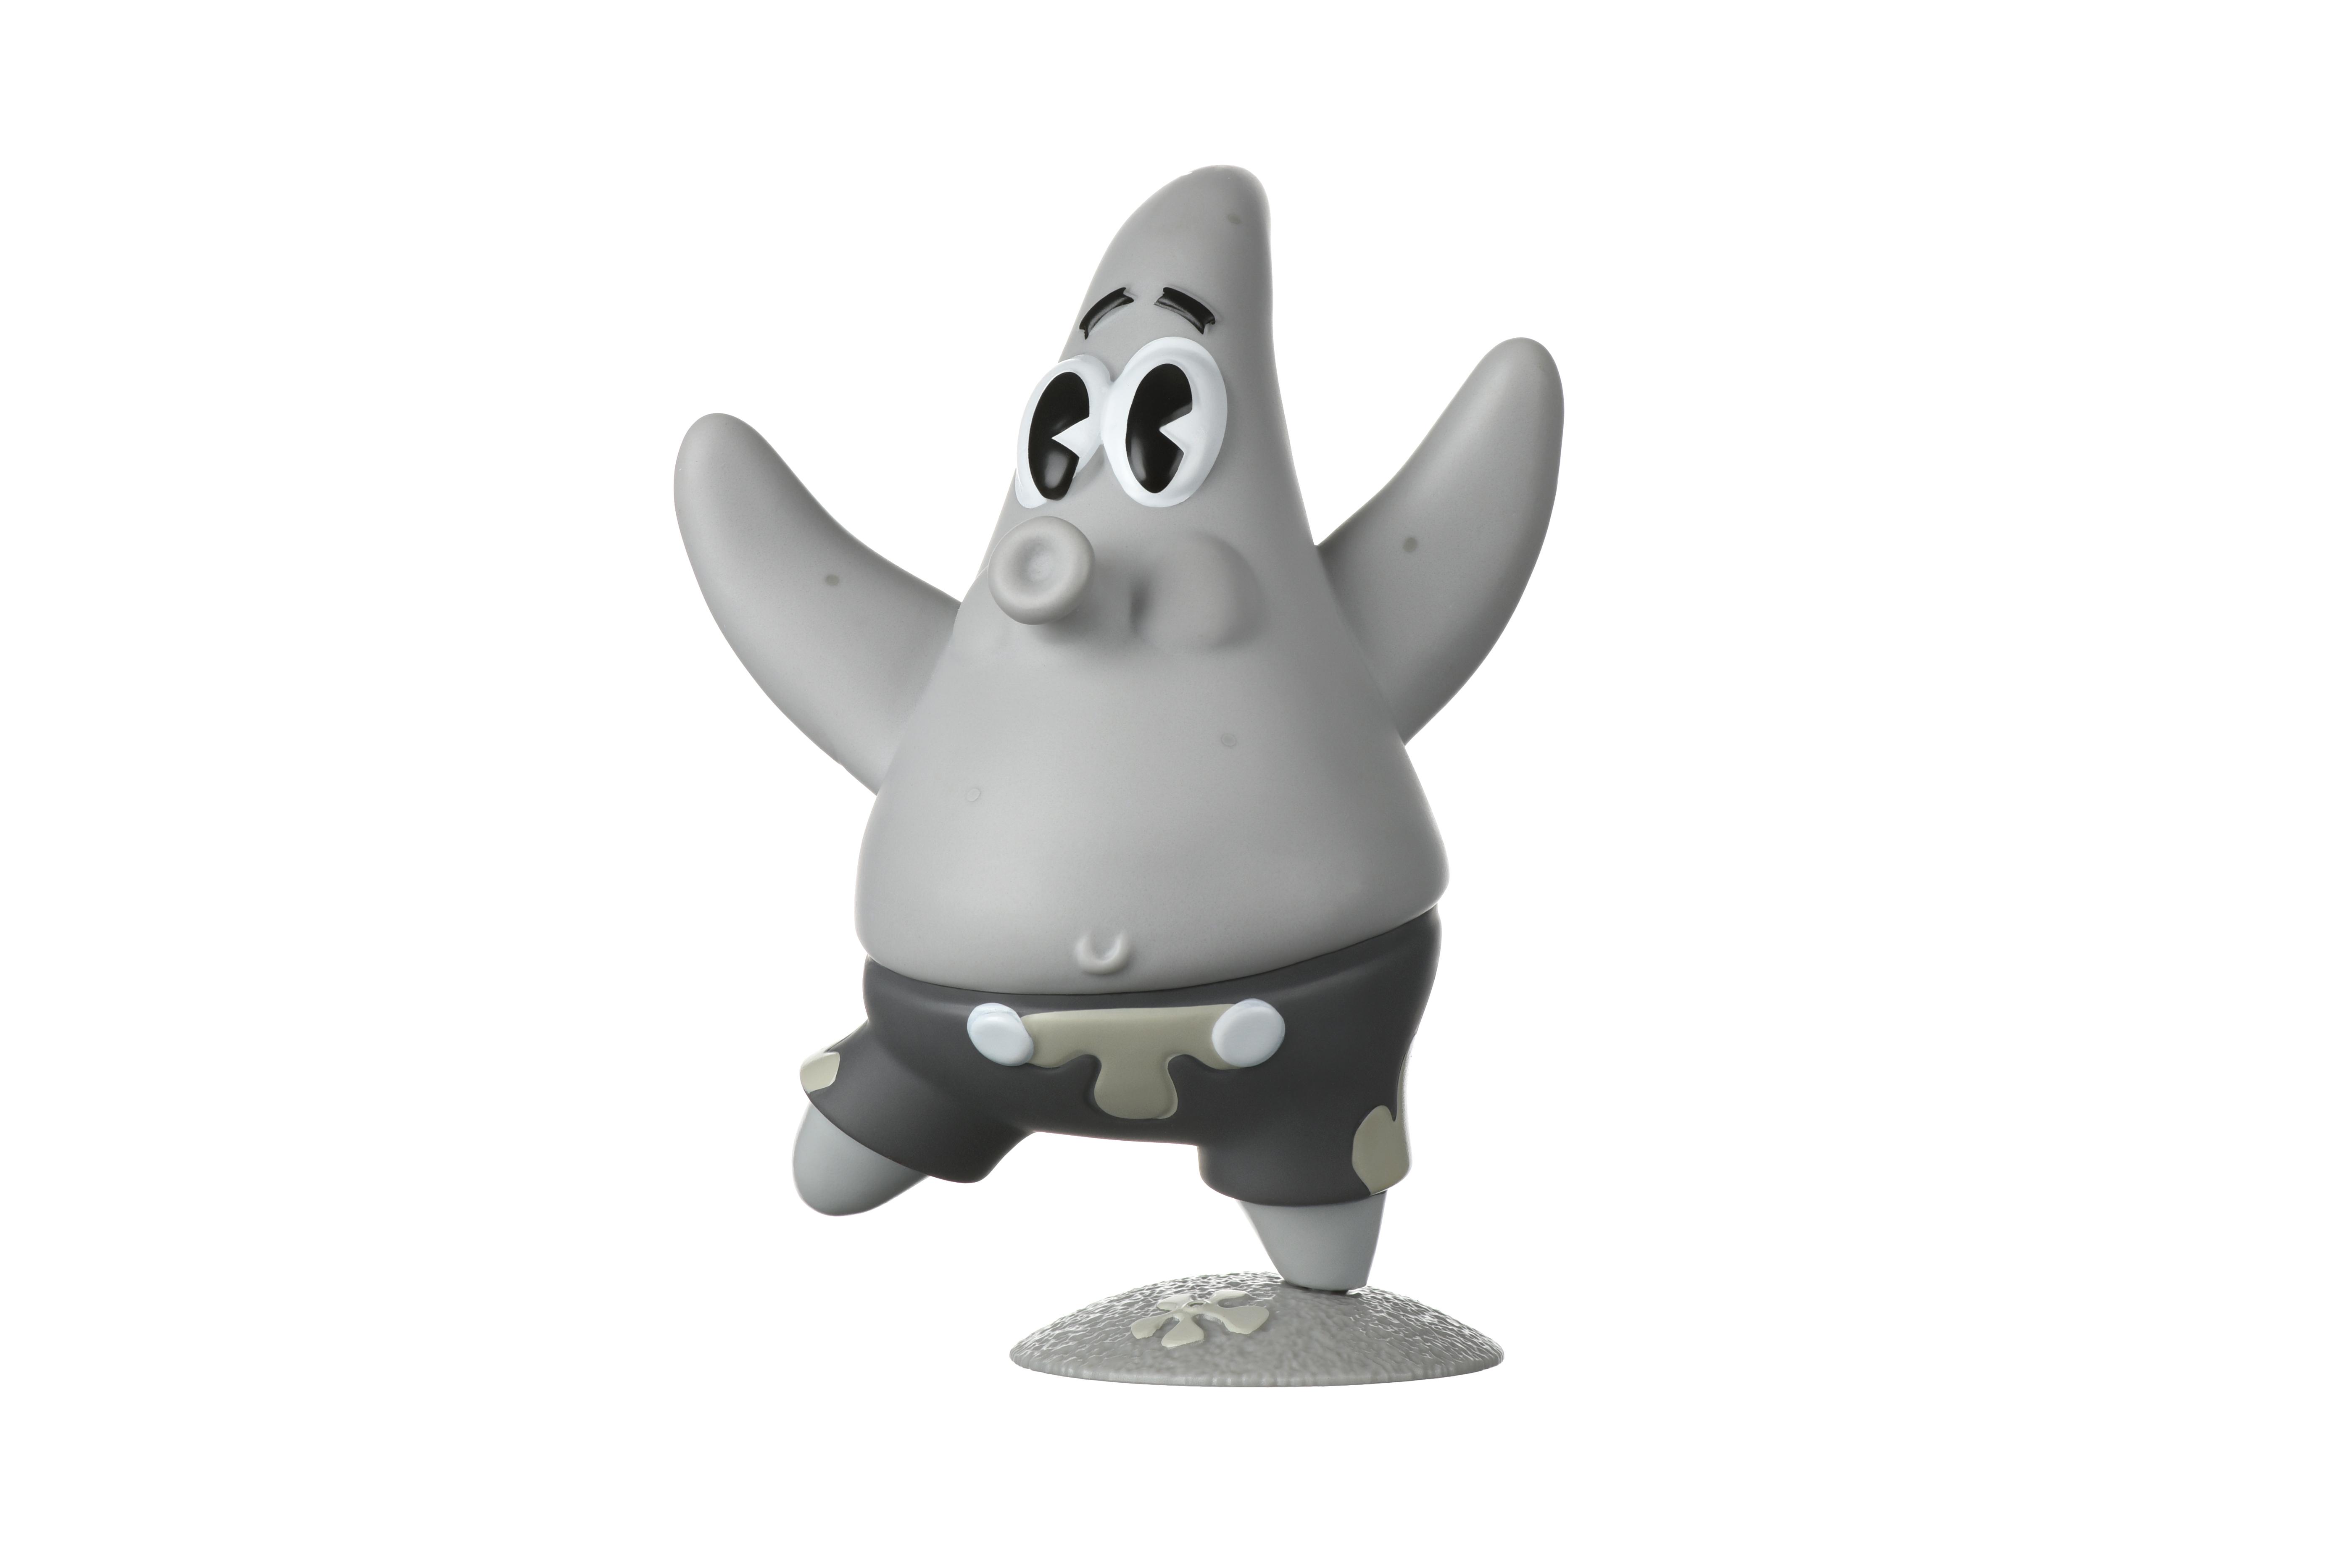 Sponge Bob Ігрова фігурка SpongePop CulturePants - Old Timey Patrick